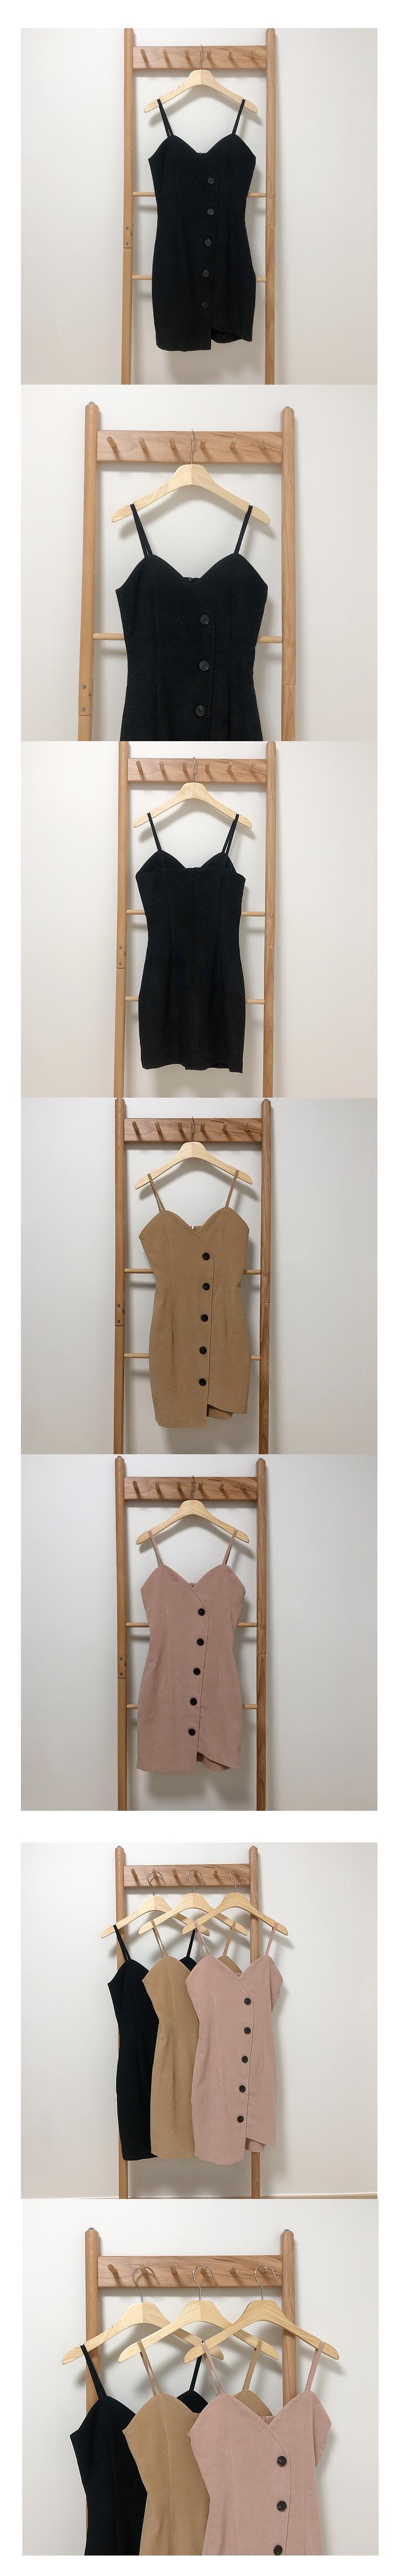 Strap-on button dress